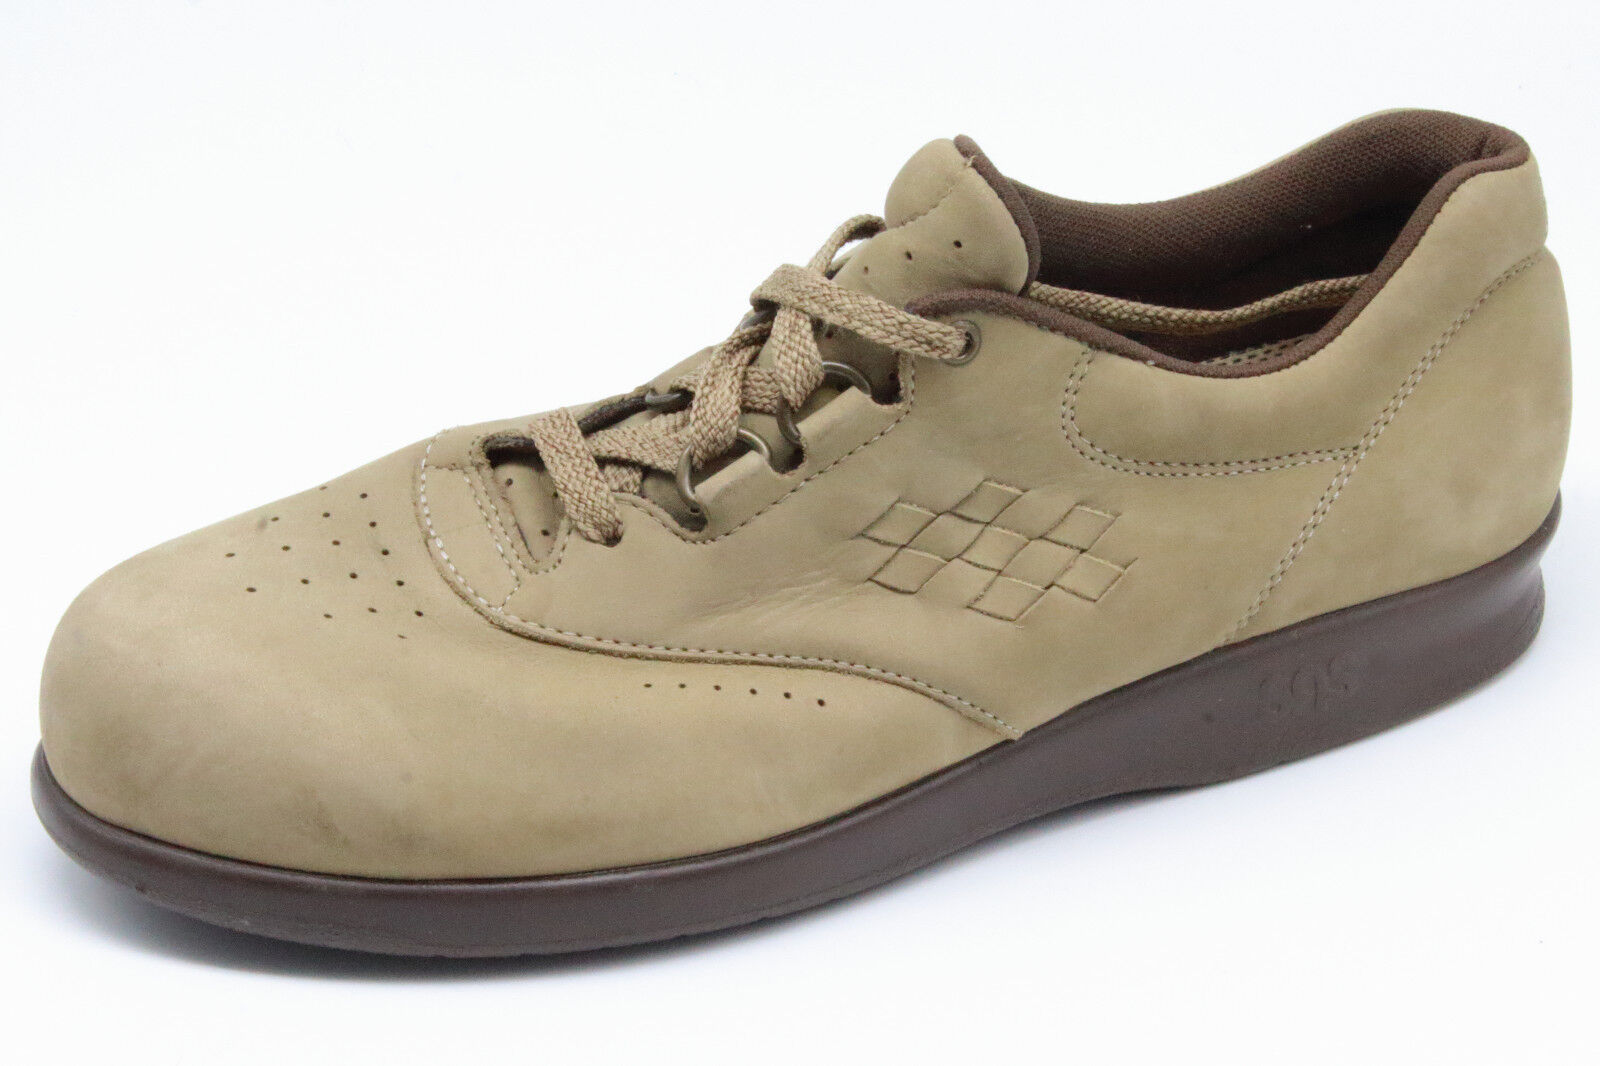 SAS Free Time Tripad Comfort Tan Suede Lace Up shoes Women's 8 1 2 S - Narrow